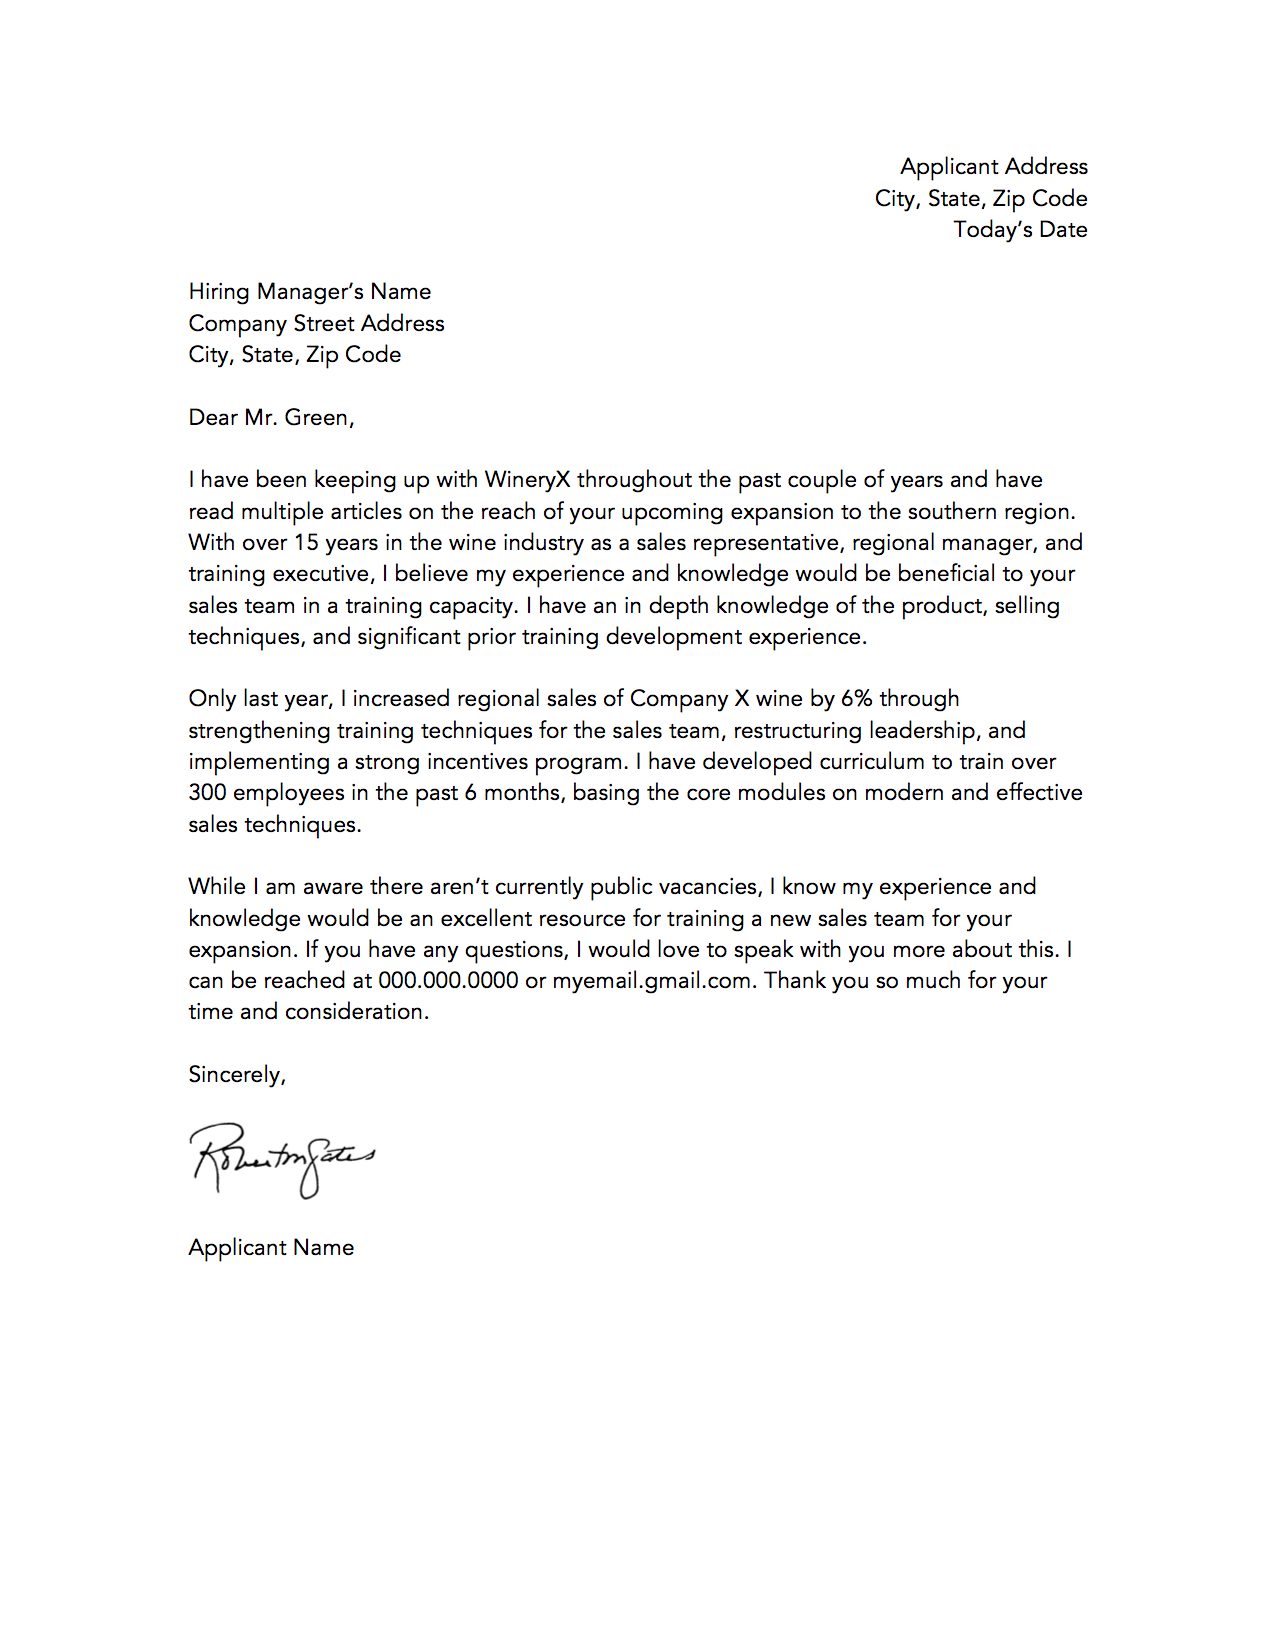 job covering letter